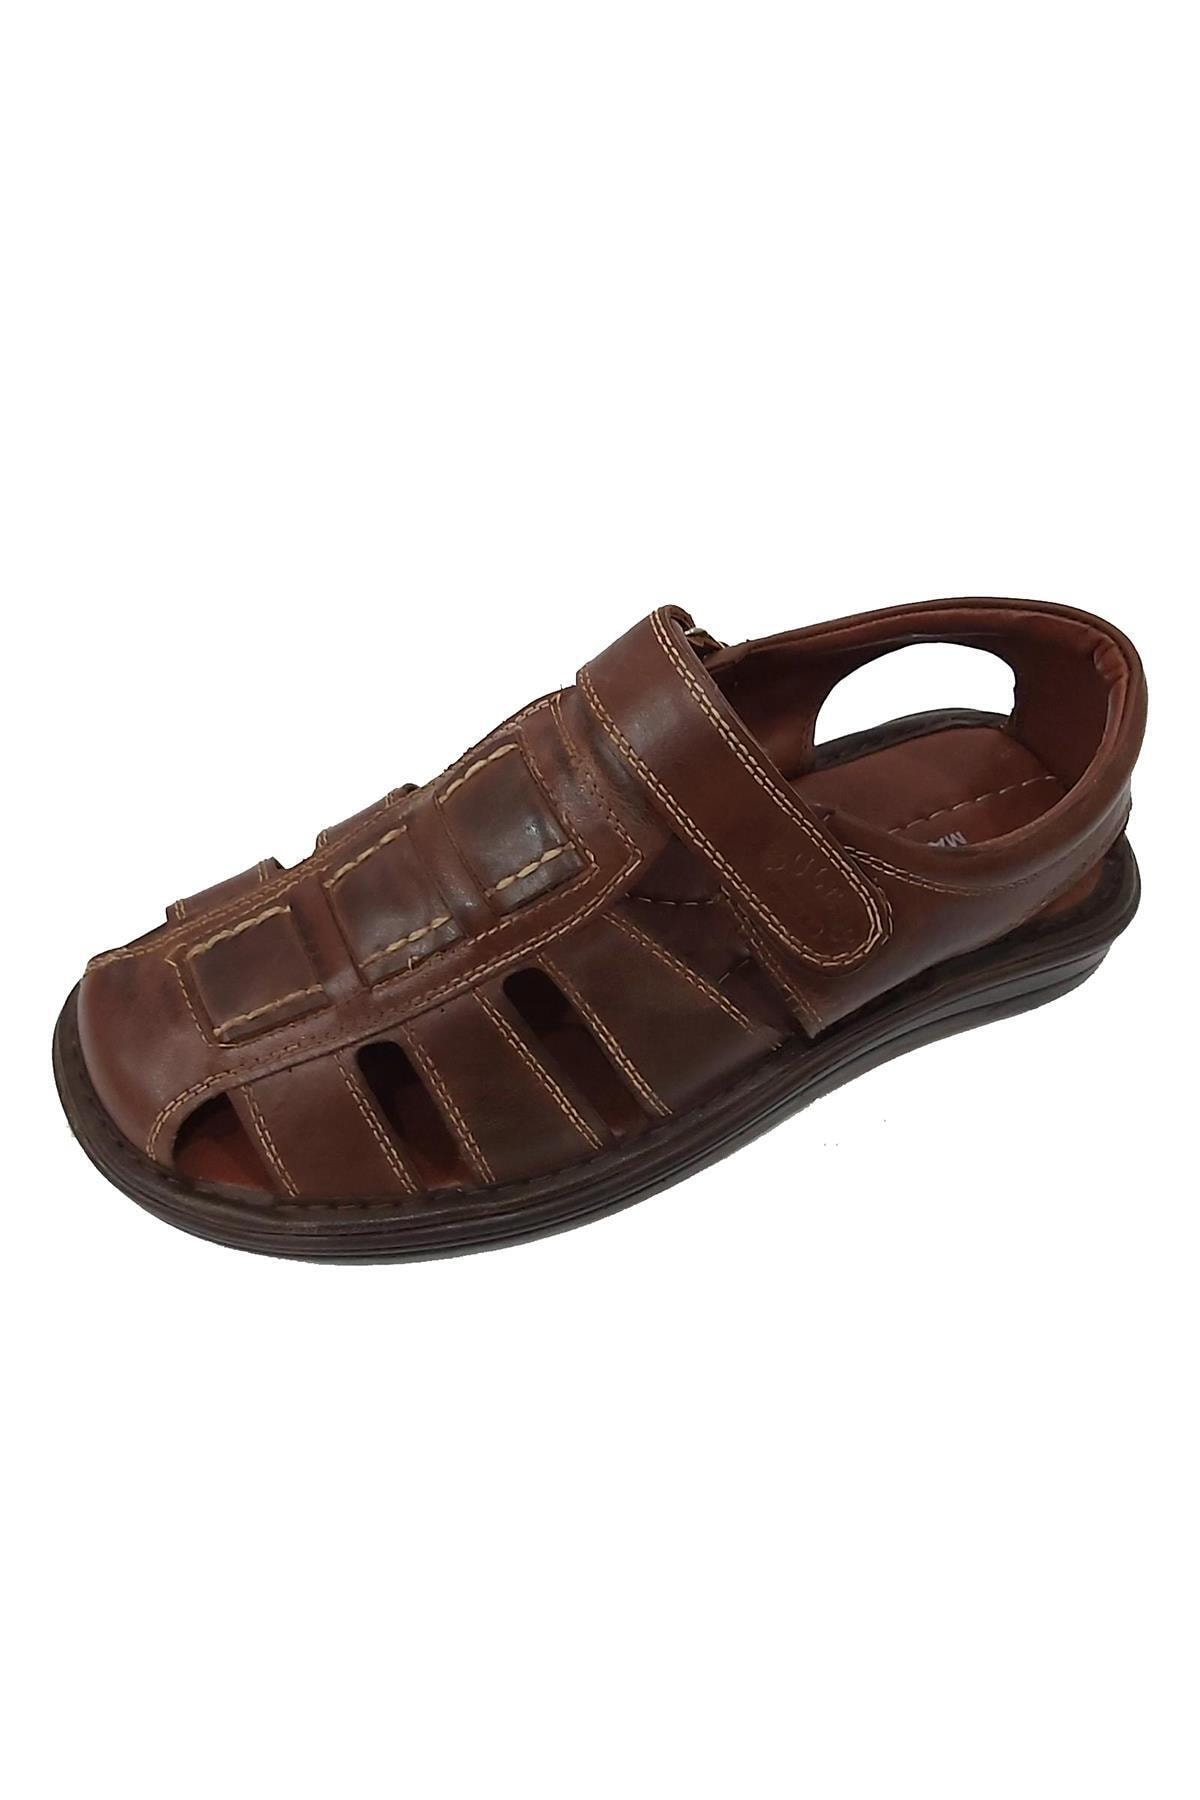 Sultan 214 Hakiki Deri Hafif Erkek Sandalet 1